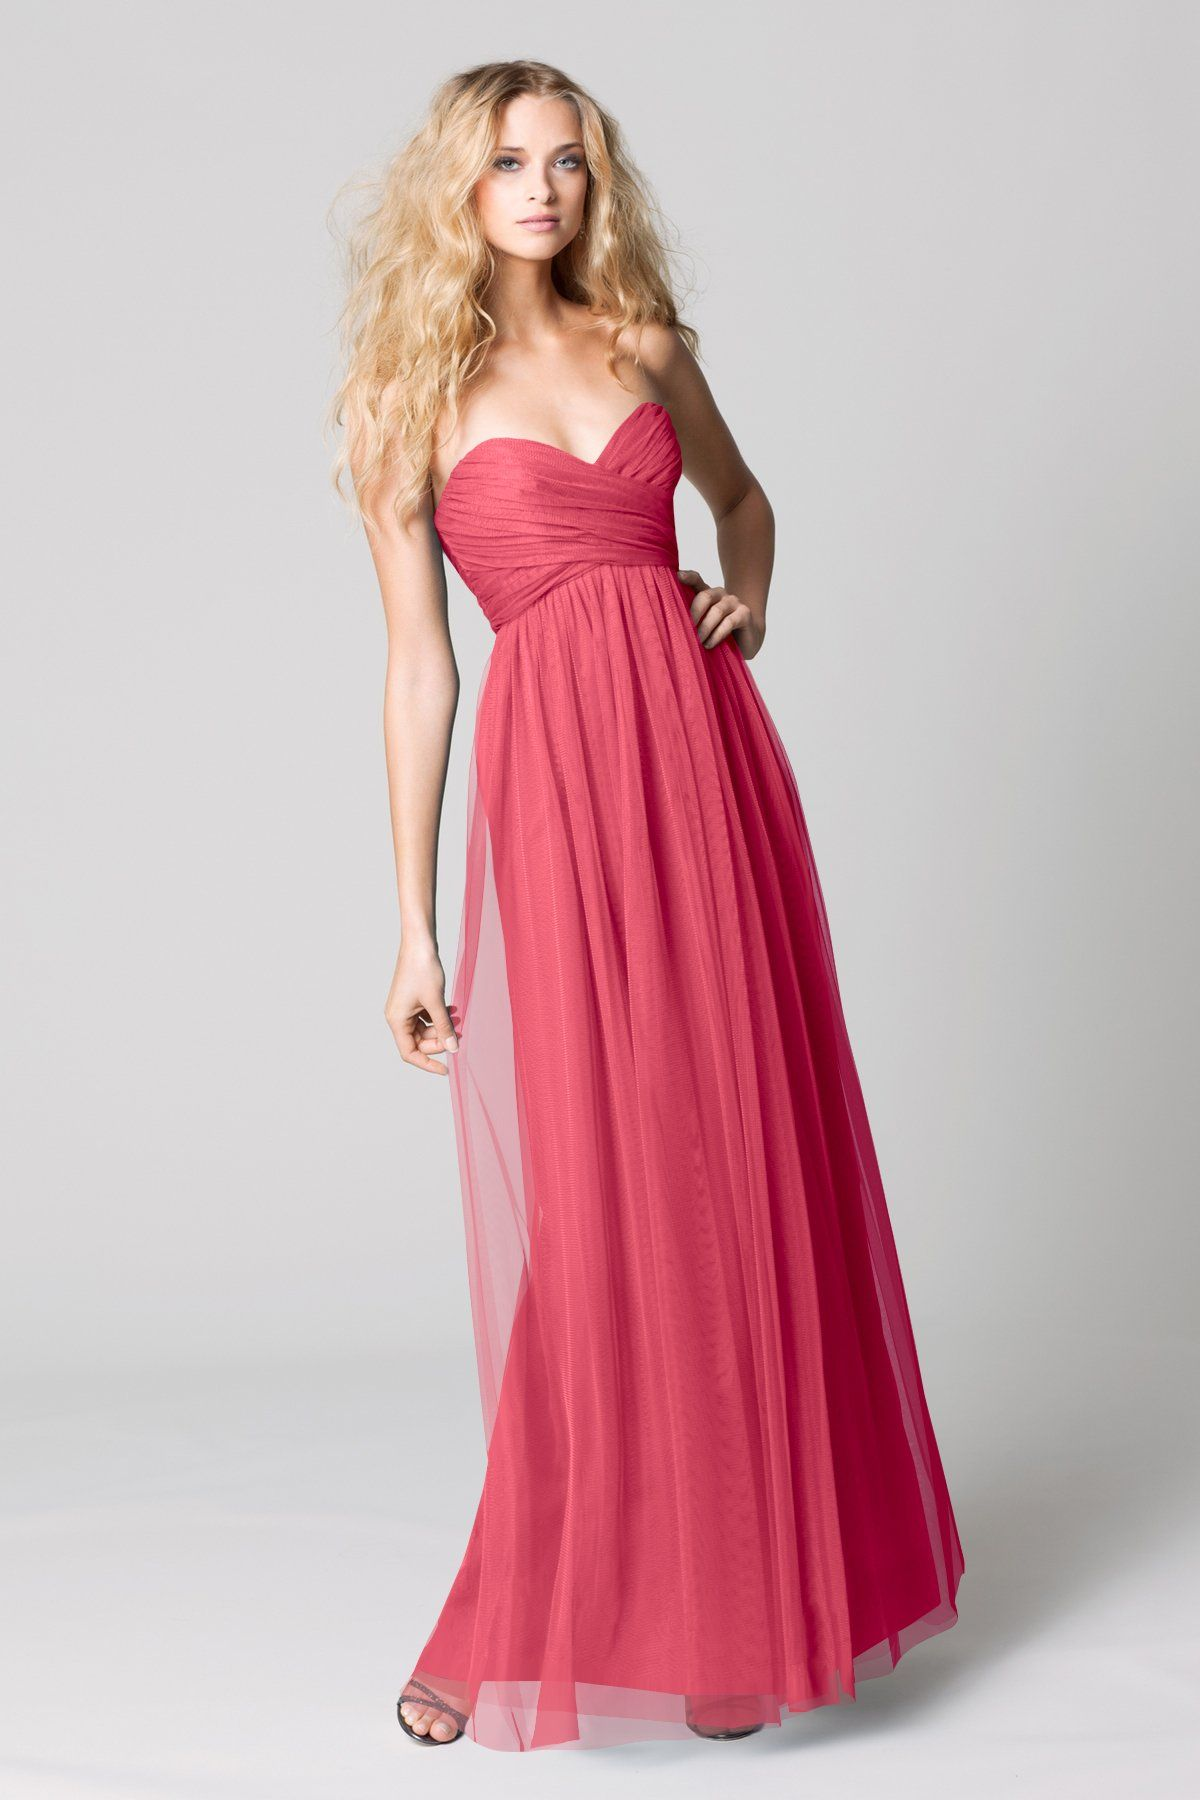 Wtoo 337 bridesmaid dress watermelon bobbinet colour 2 watermelon wtoo 337 bridesmaid dress watermelon bobbinet colour 2 watermelon ombrellifo Image collections